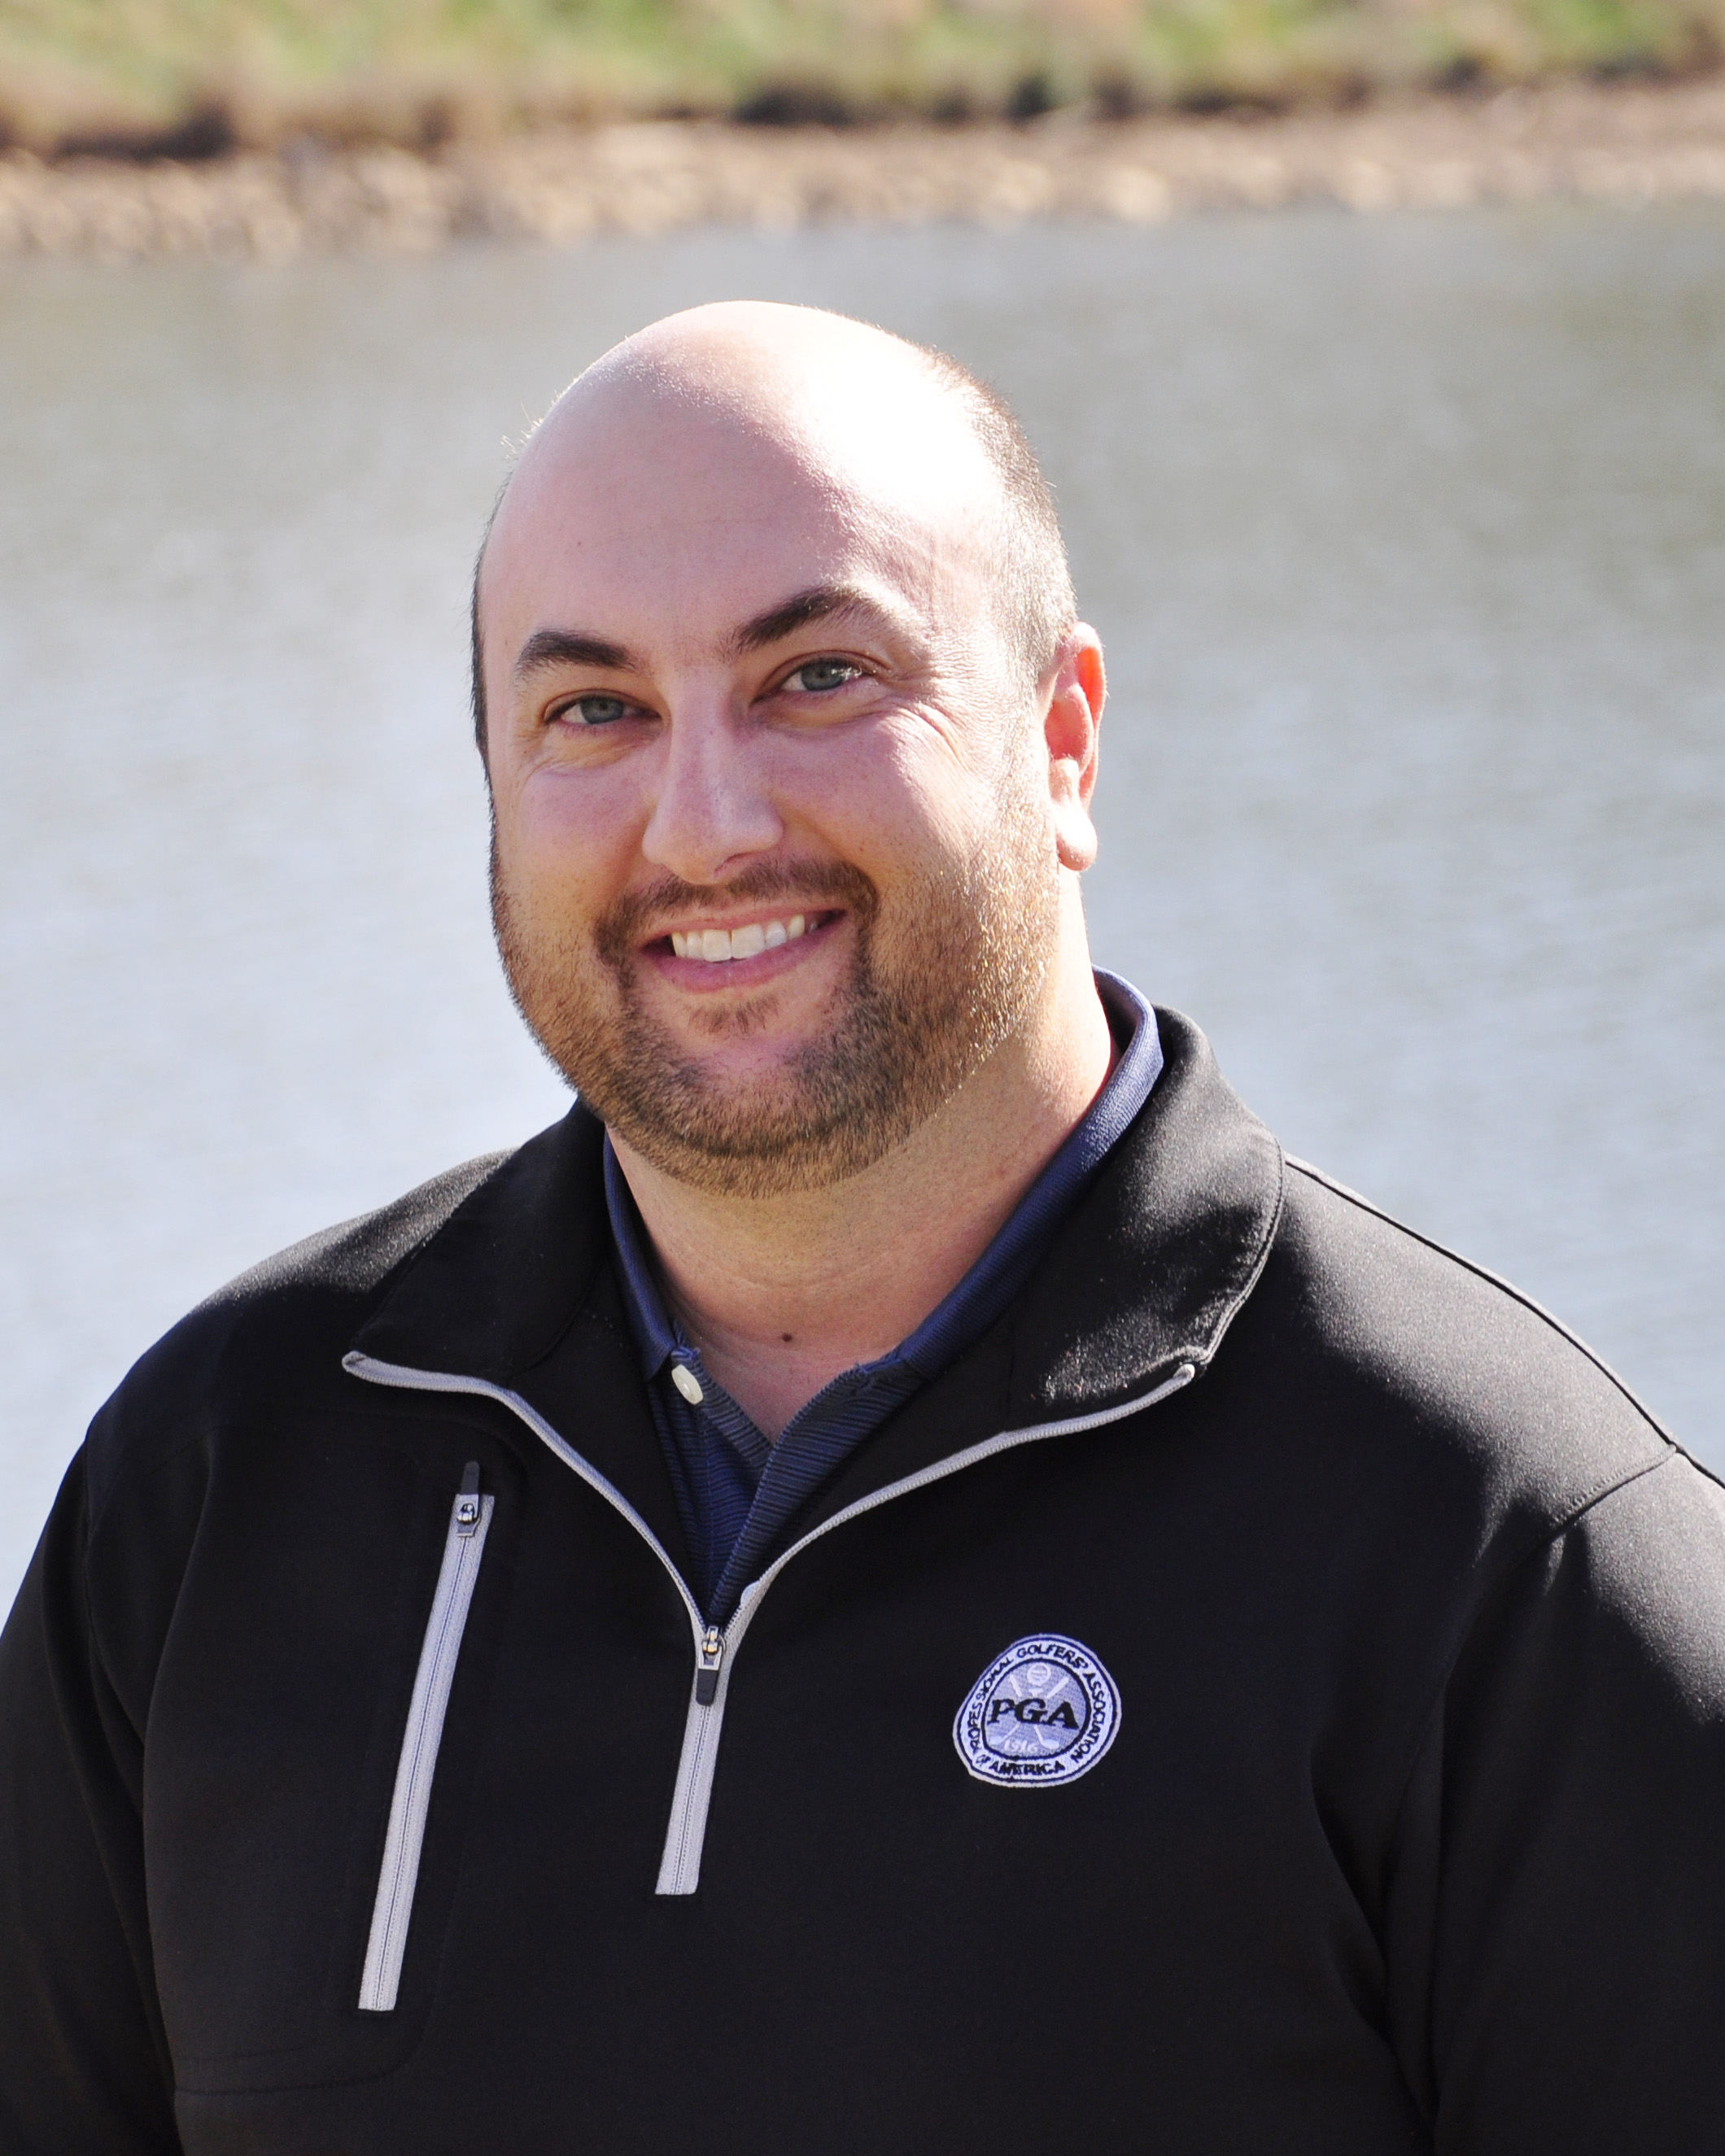 Adam Jacob - Golf Professional